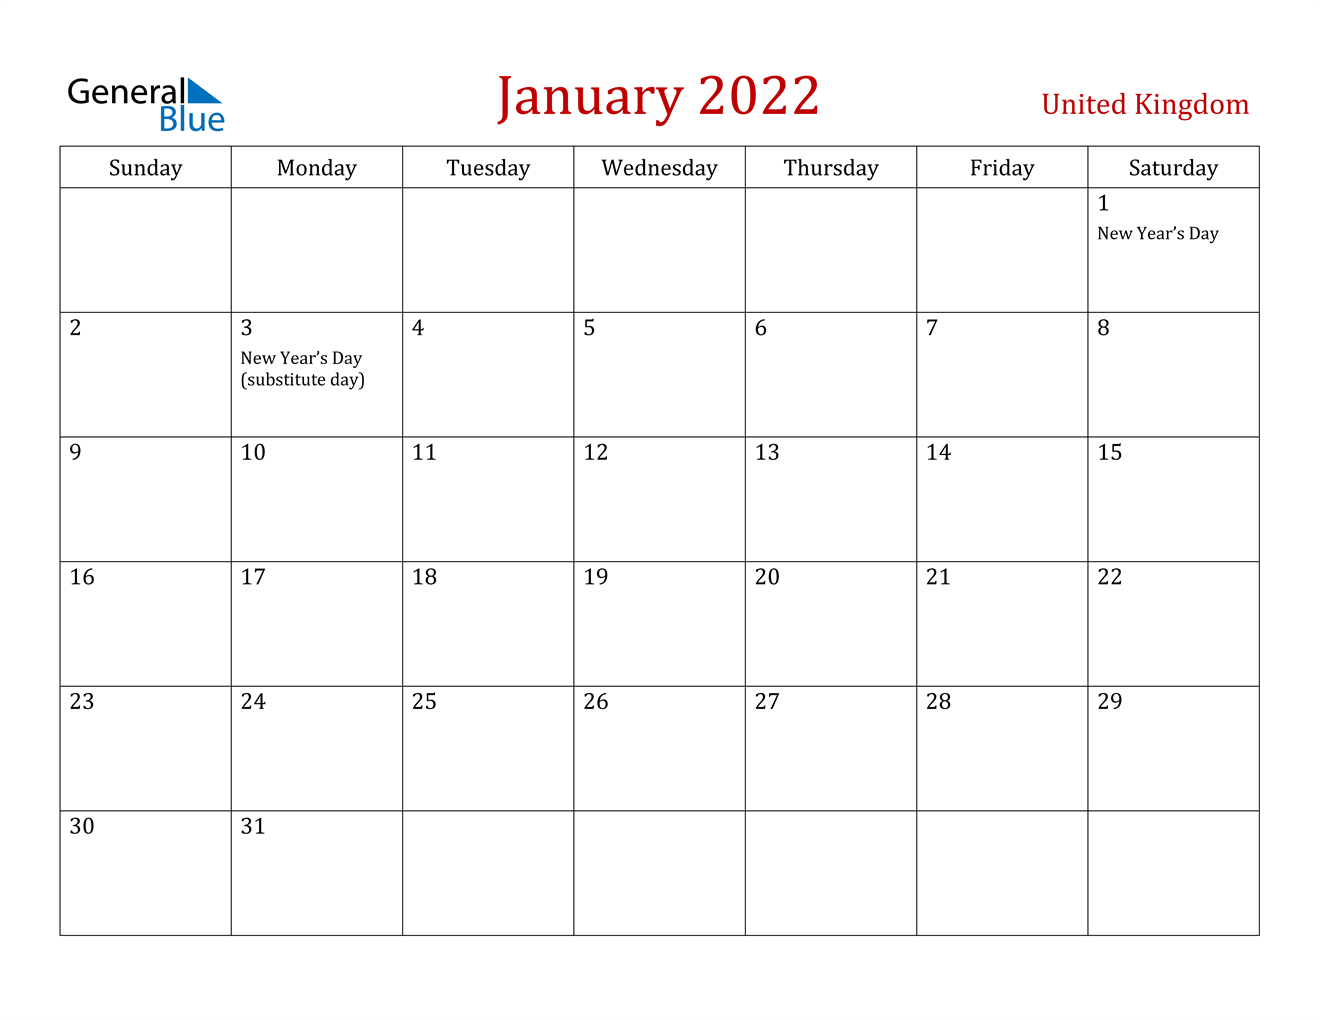 January 2022 Calendar - United Kingdom Regarding Januarycalendar 2022 With Holidays